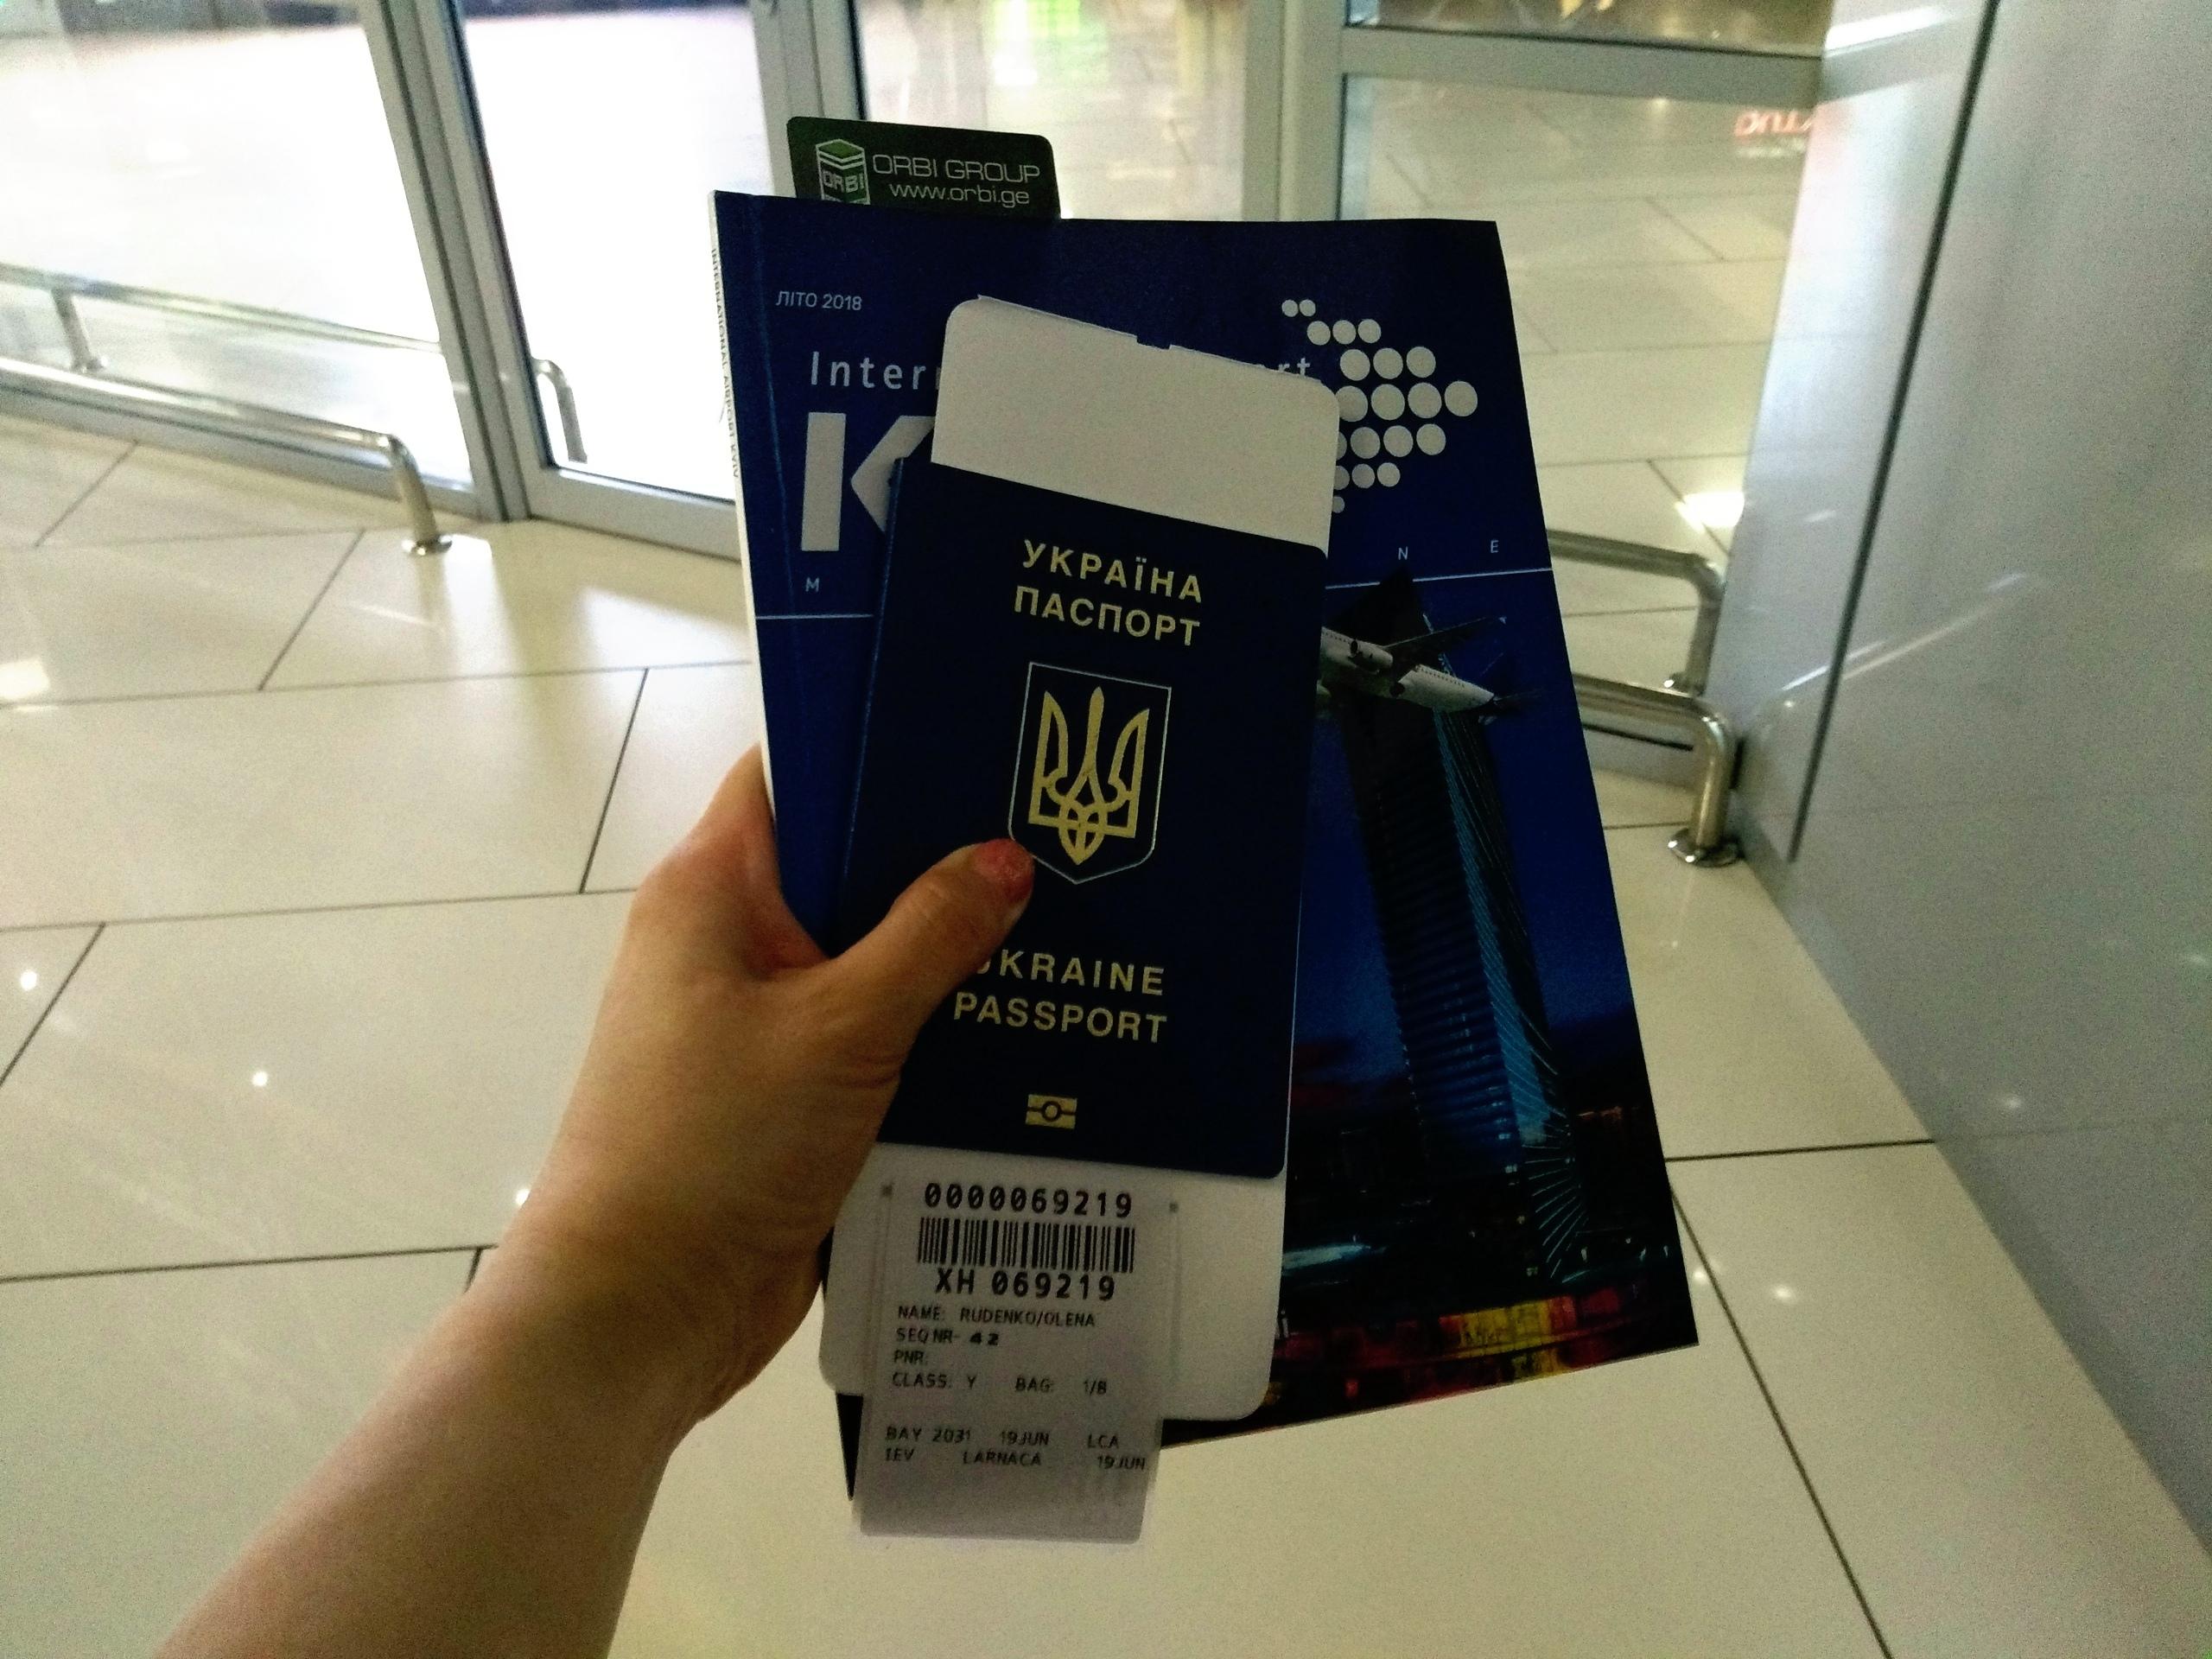 Елена Руденко (Валтея). Украина. Киев. Фото и описание.  FTxW5Z9gFNQ